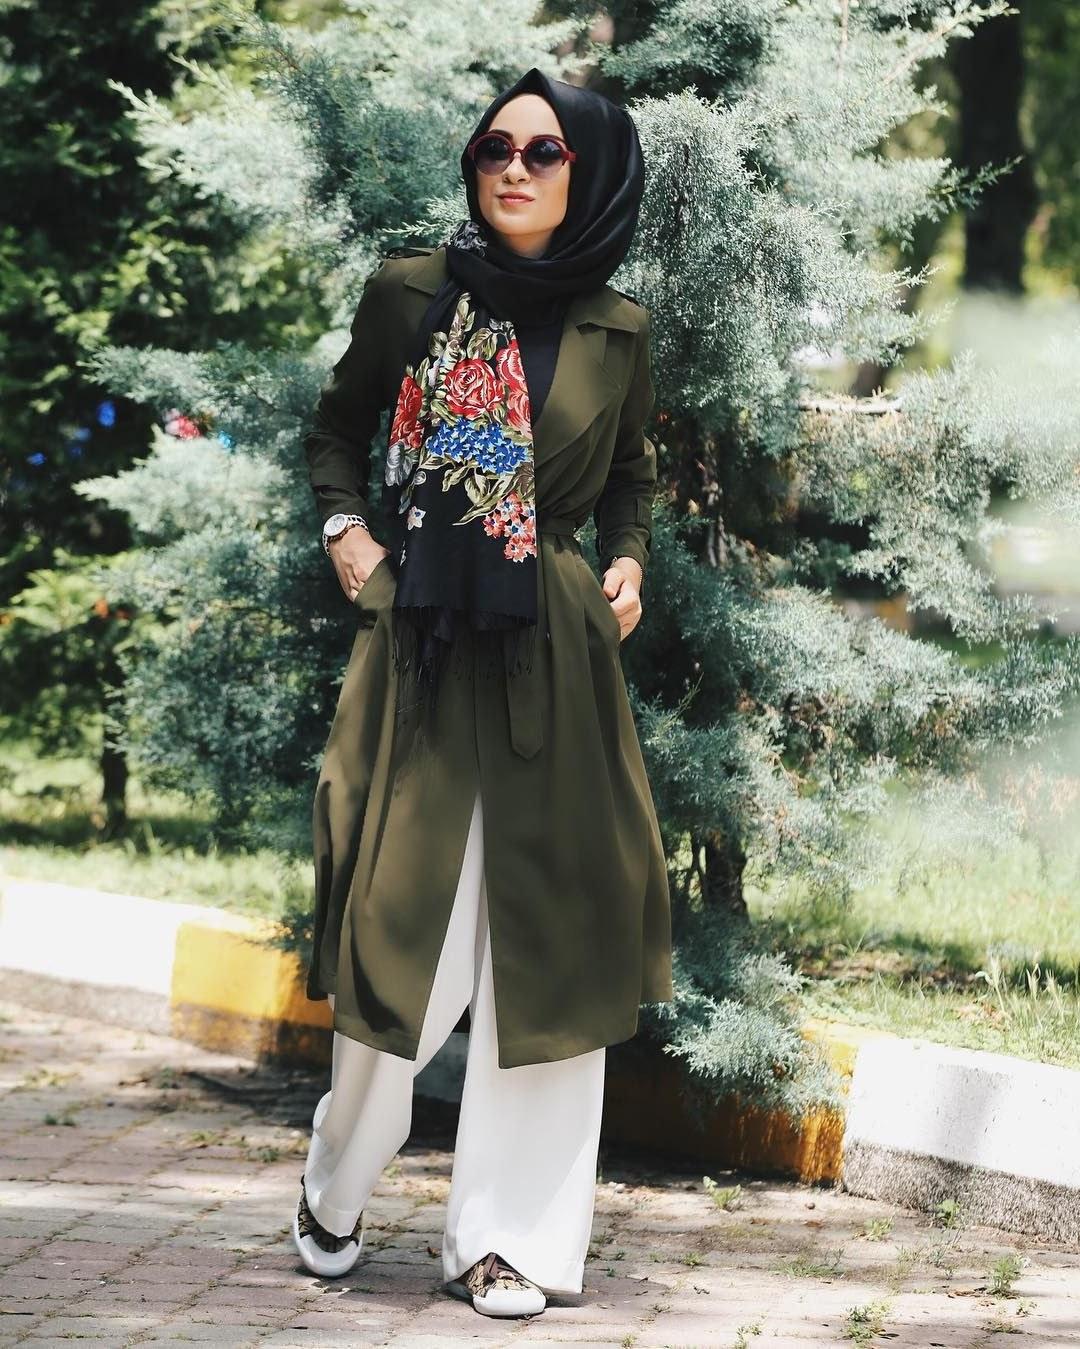 Bentuk Fashion Muslimah Modern S5d8 See This Instagram Photo by Senaseveer • 4 708 Likes